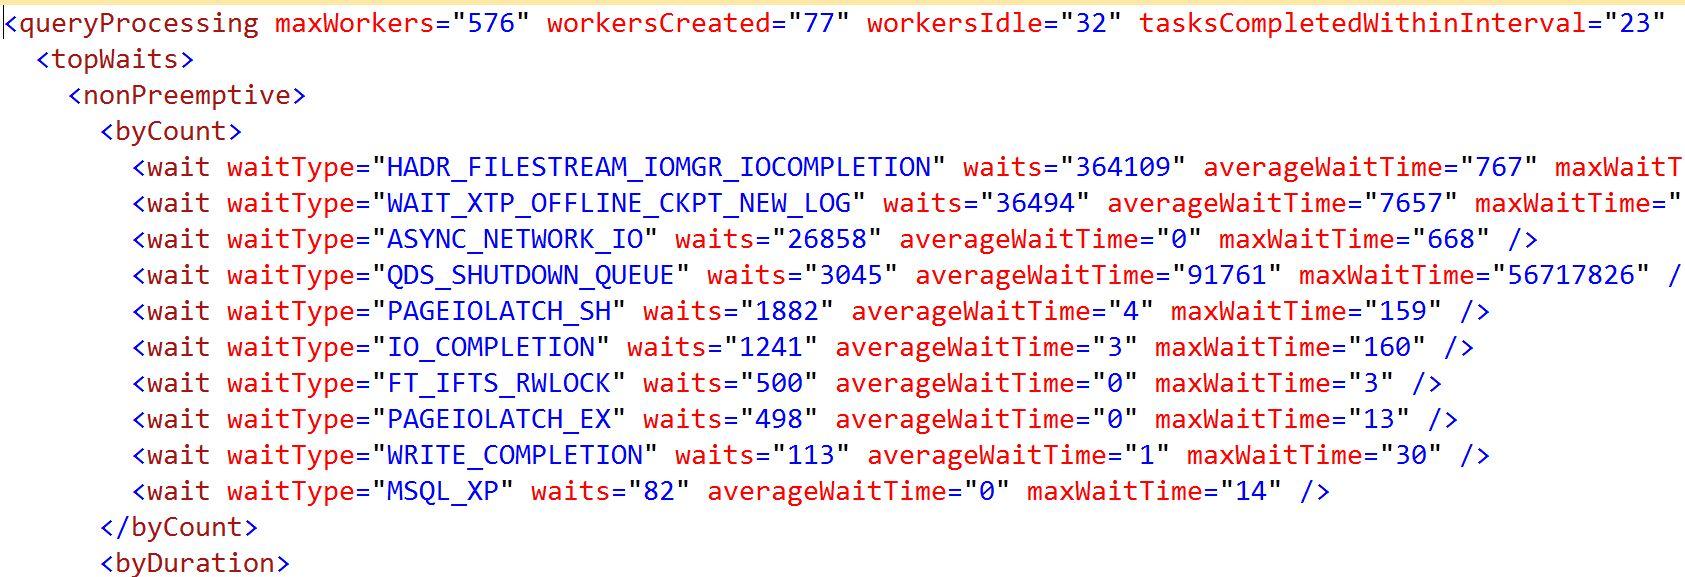 queryprocessing xml